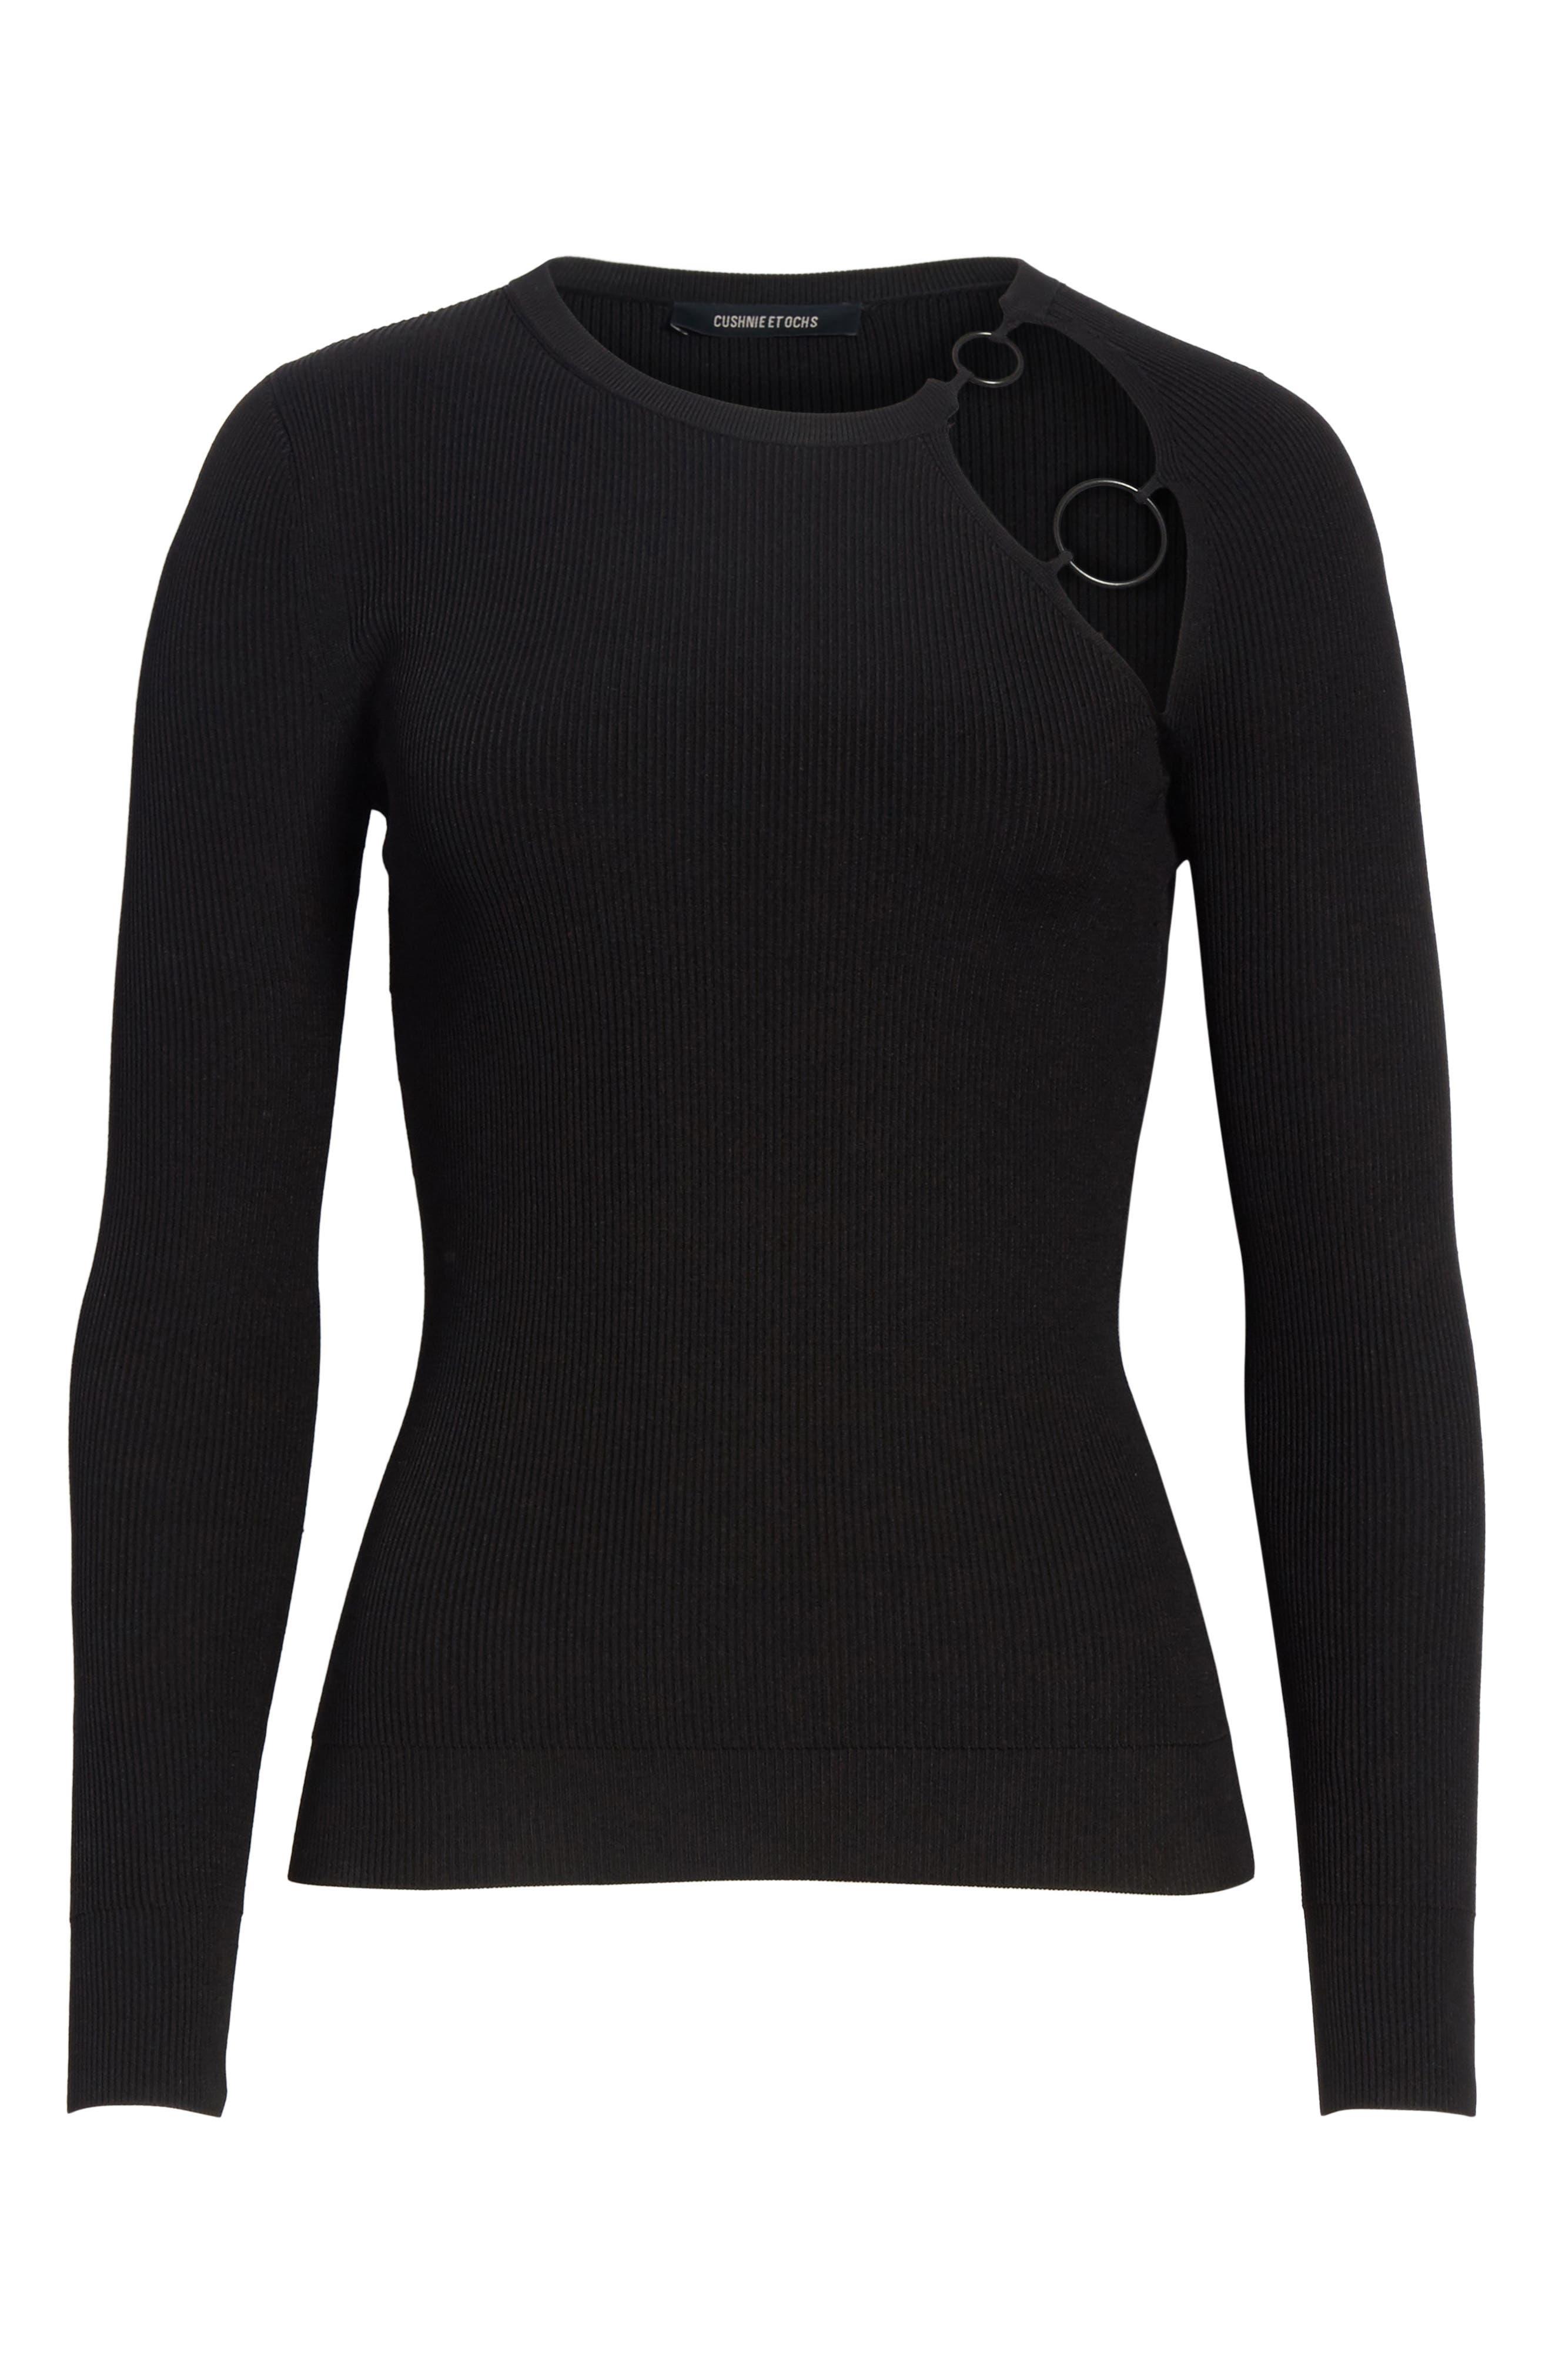 Sienna Ring Detail Knit Top,                             Alternate thumbnail 6, color,                             Black/ Matte Black